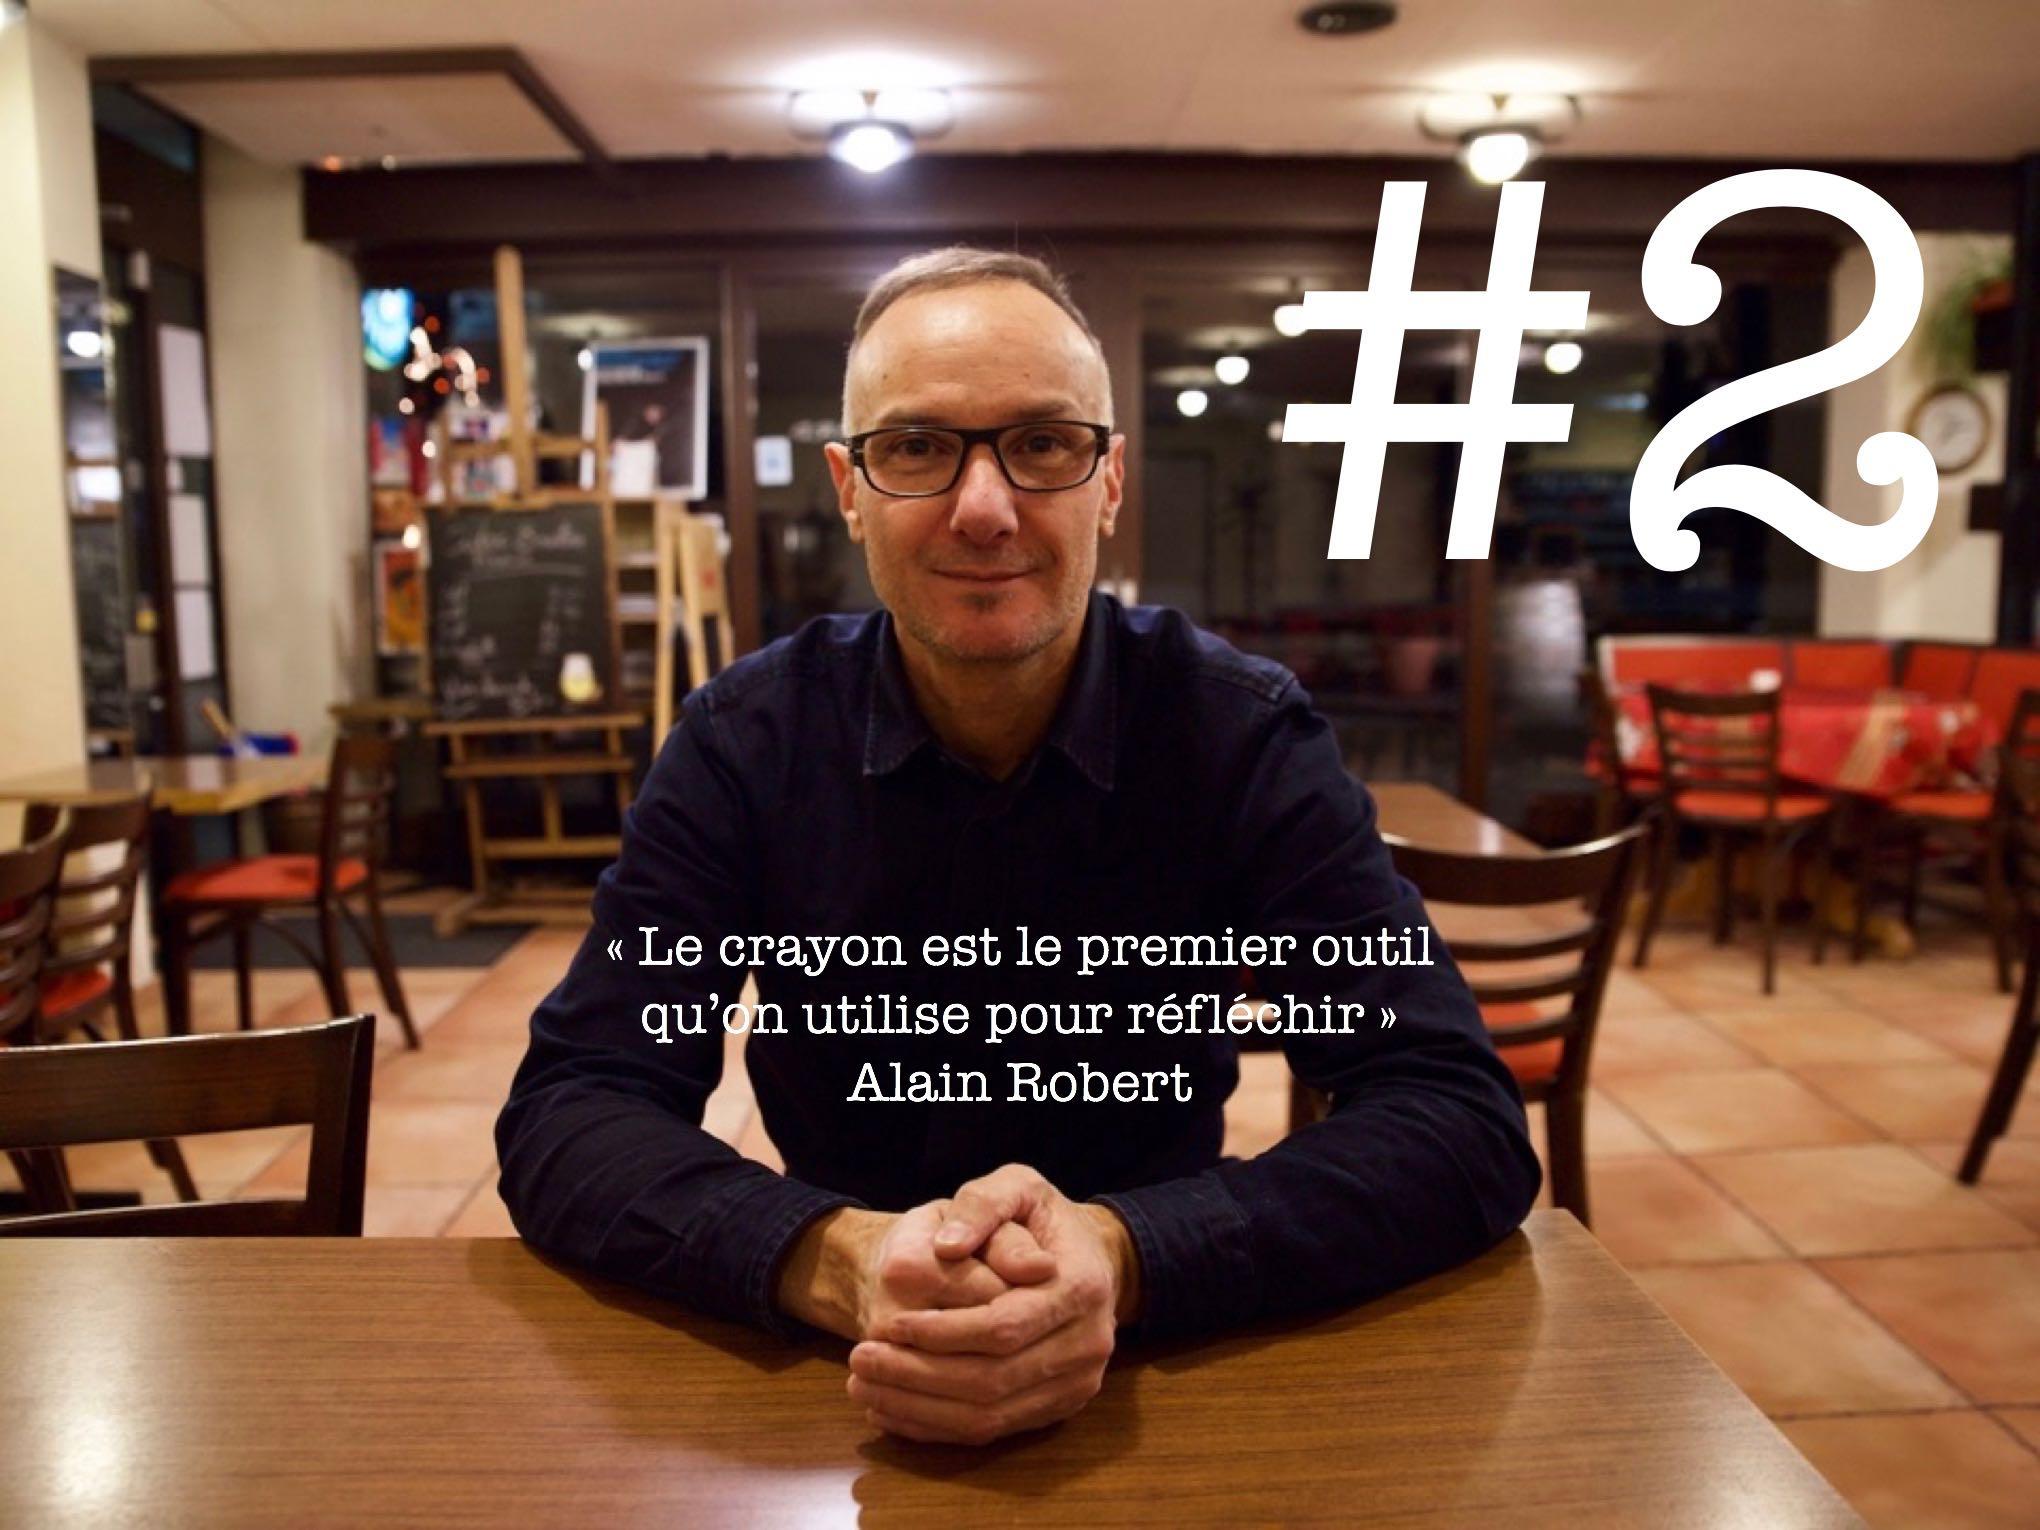 Alain Robert © DavidTrotta